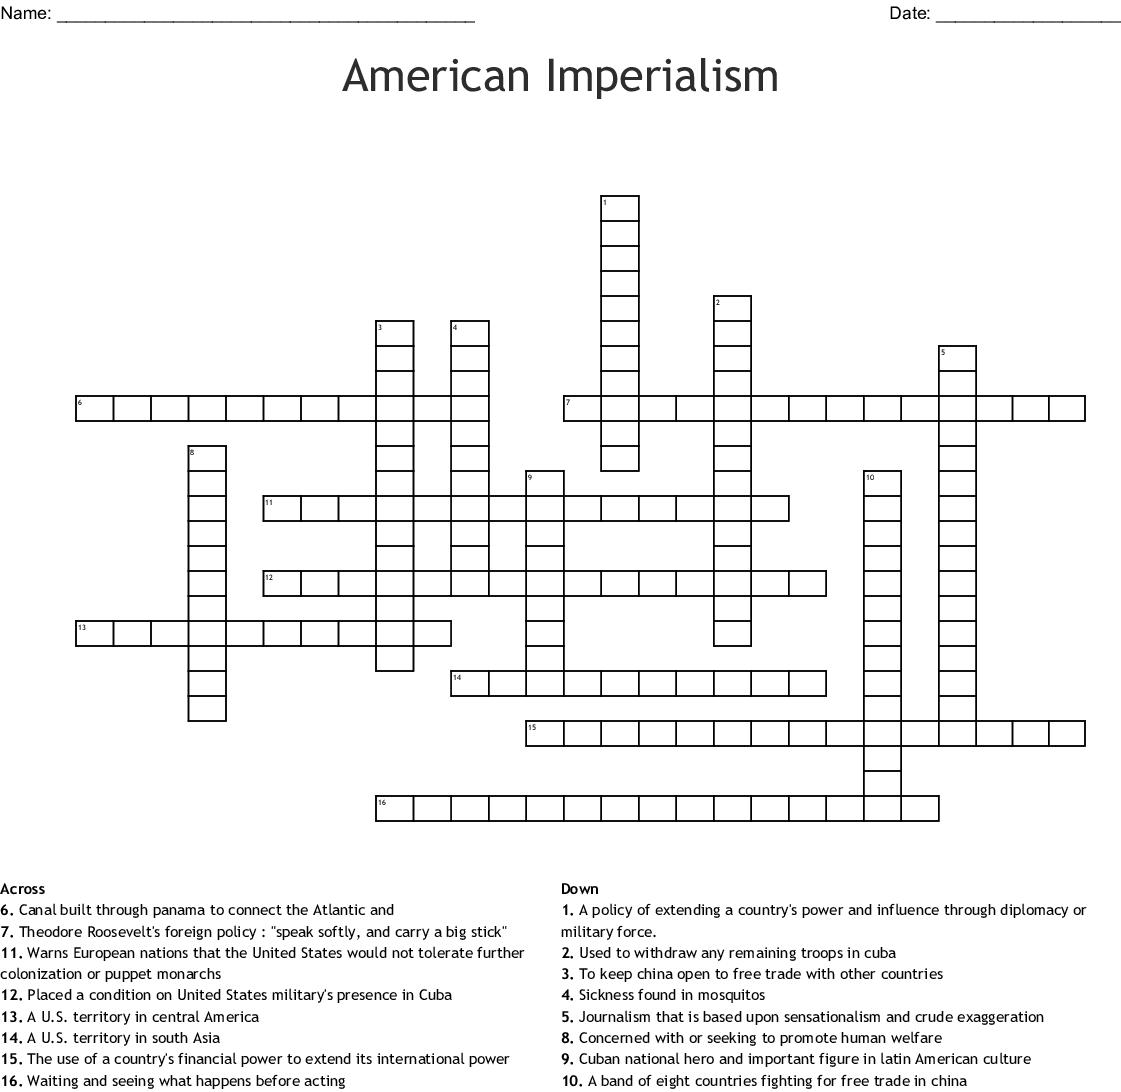 American Imperialism Crossword